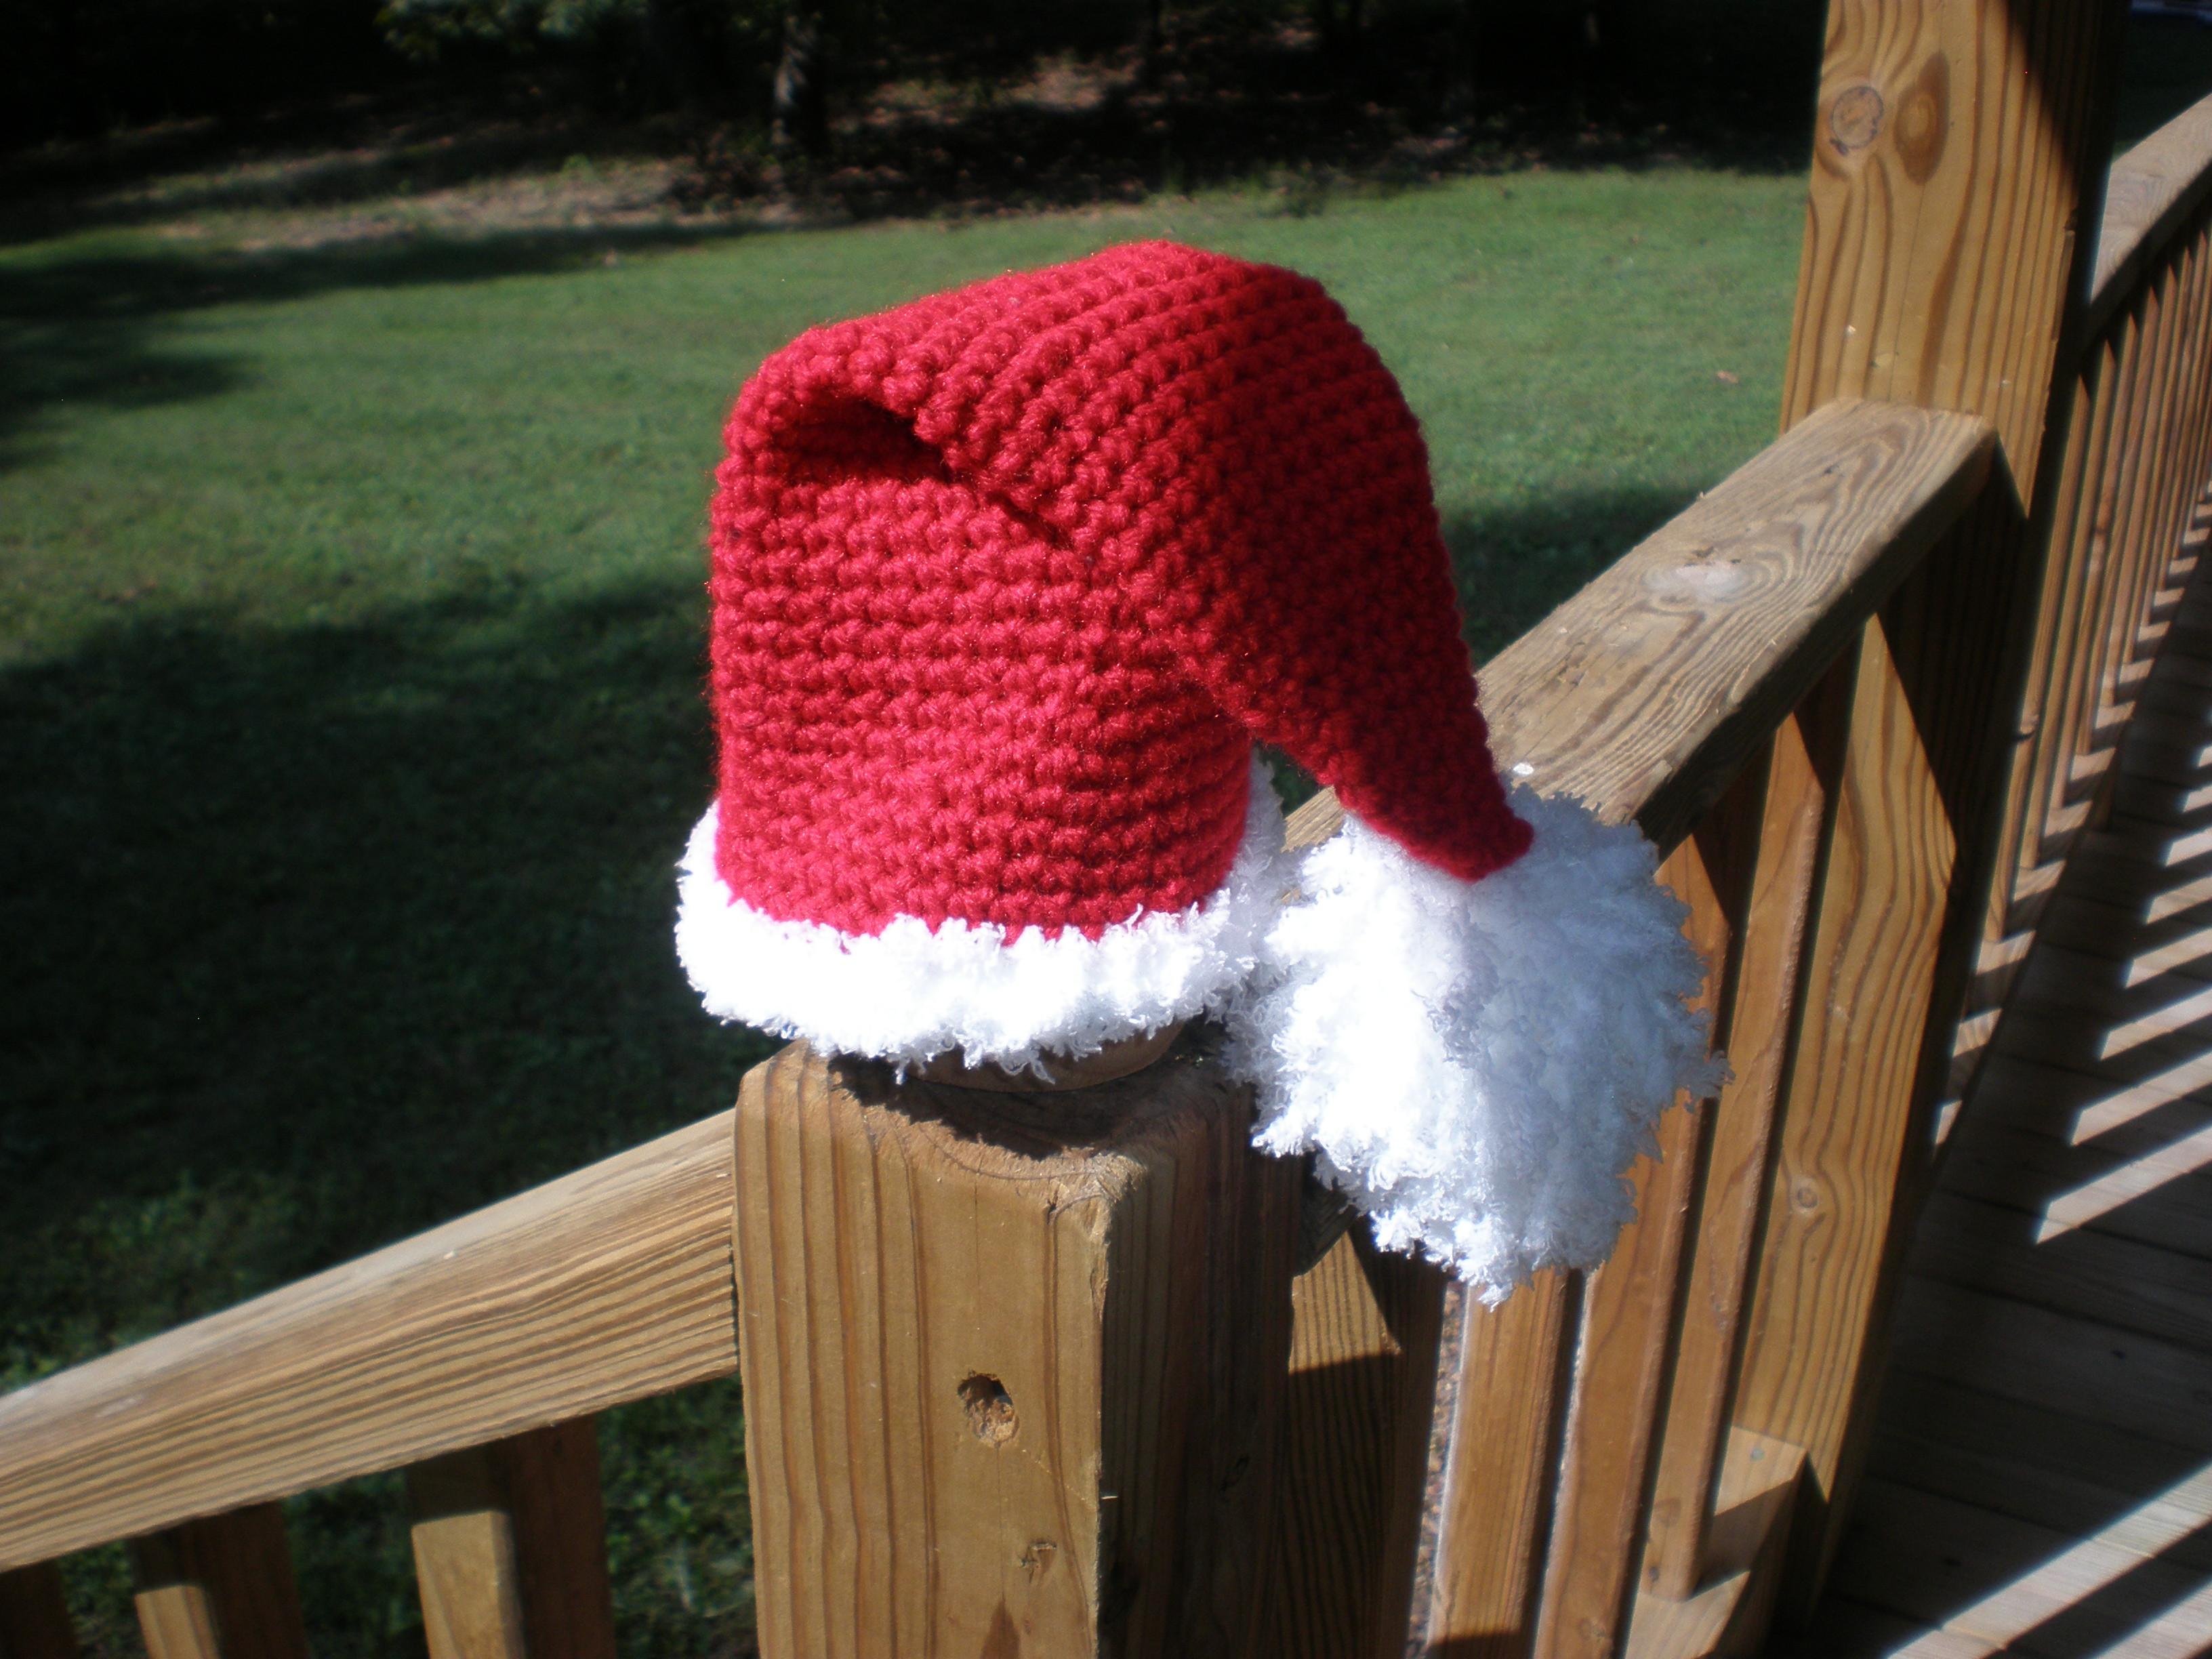 e11dfbf7b Crochet santa hat   diaper cover · CuteNCuddly Crochet · Online ...